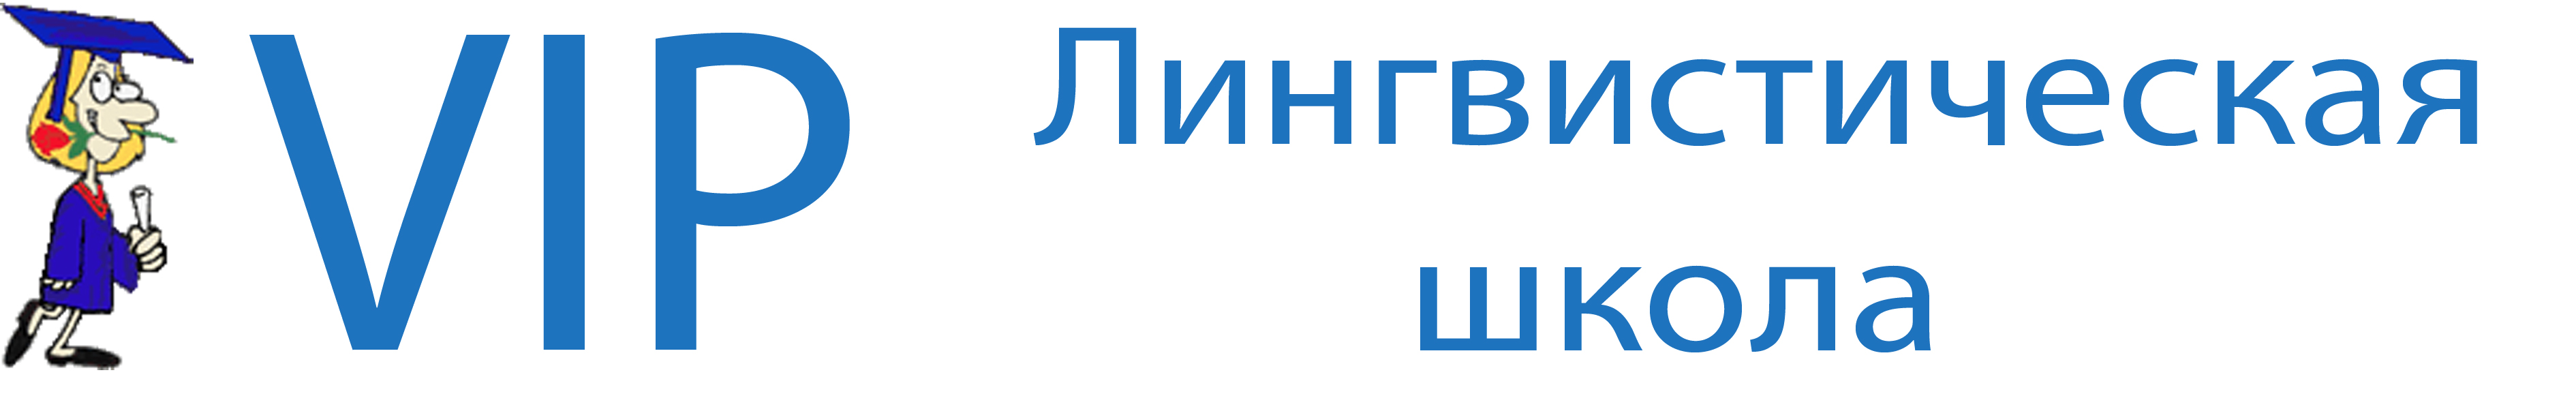 Лингвистическая школа VIP